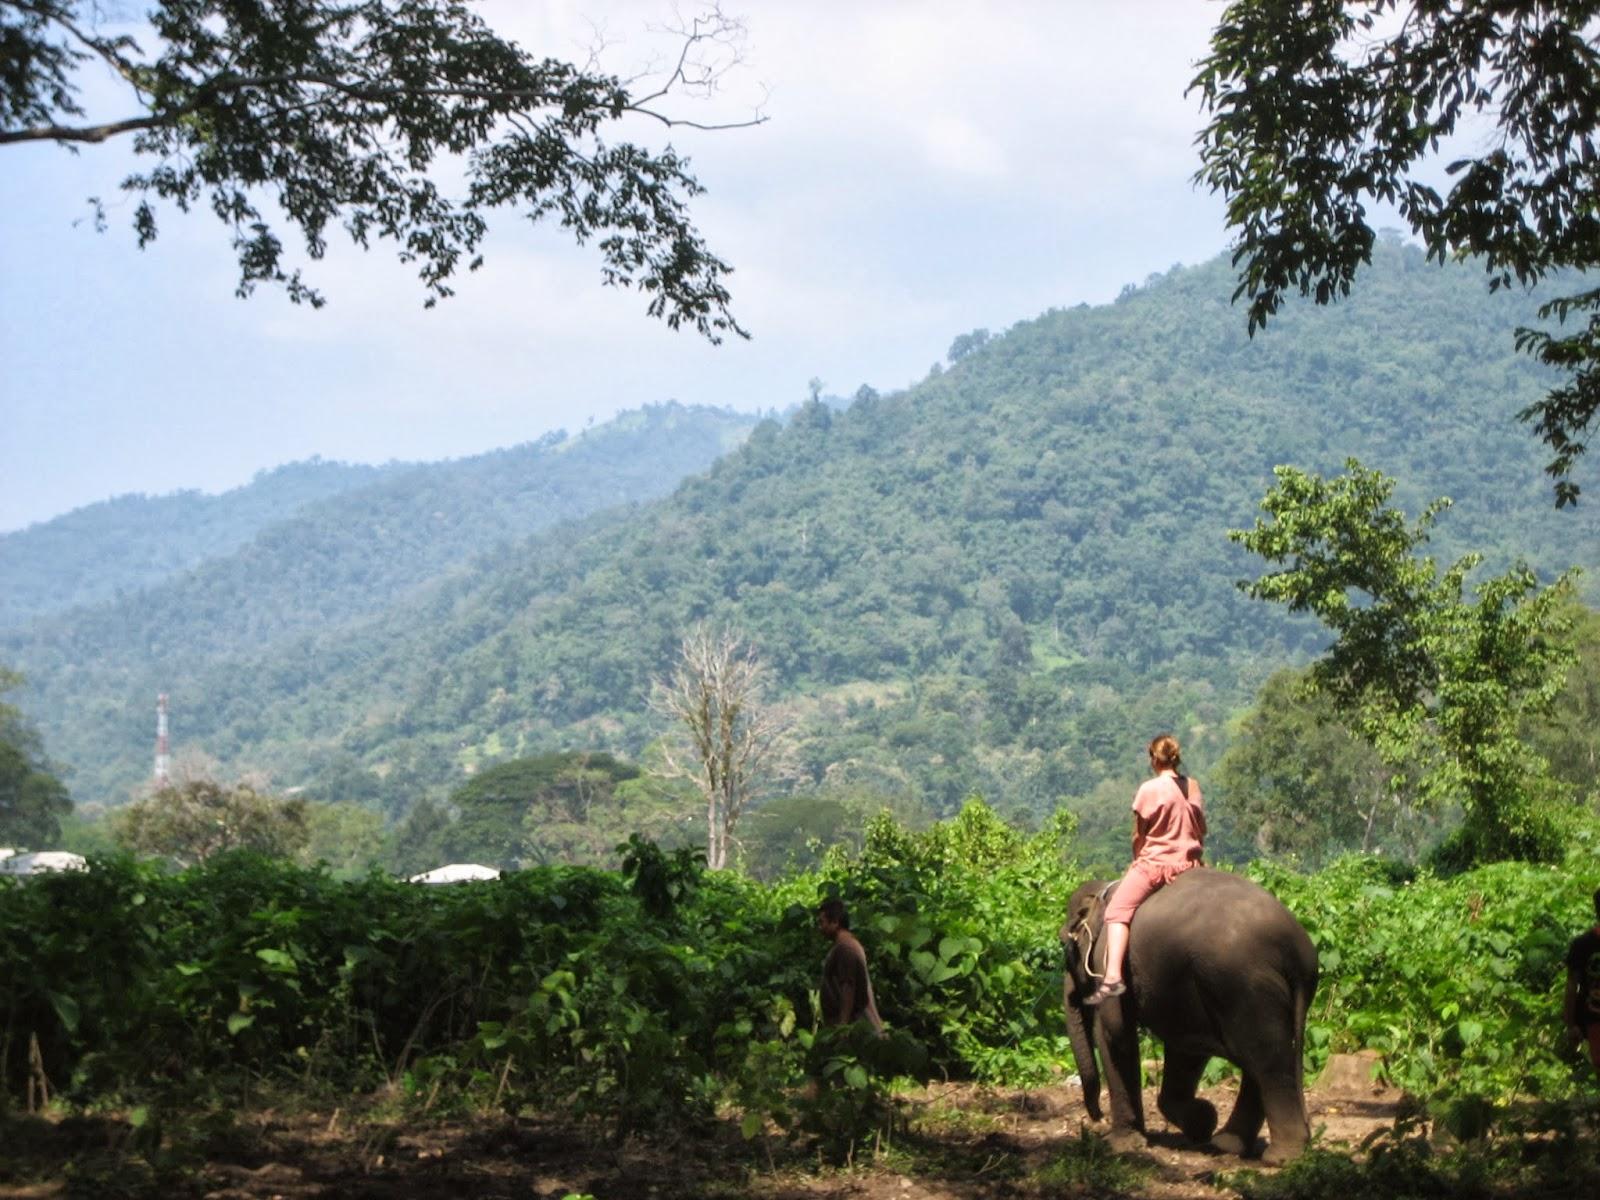 chiang-mai-elephant-jungle-jumbo-camp-mae-rim